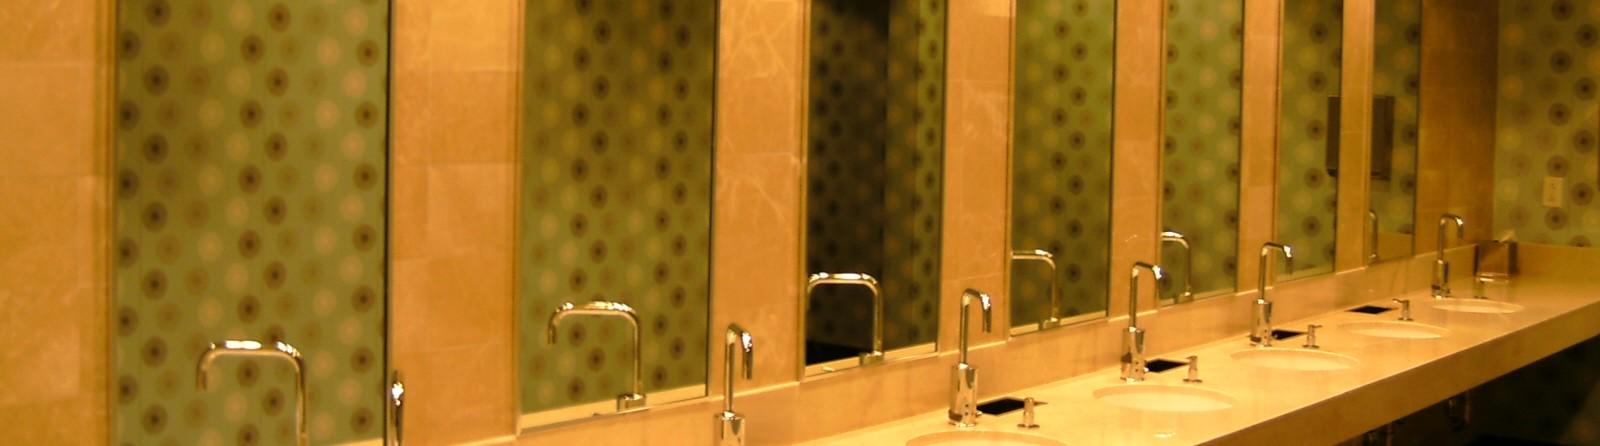 Custom Vanity Mirrors